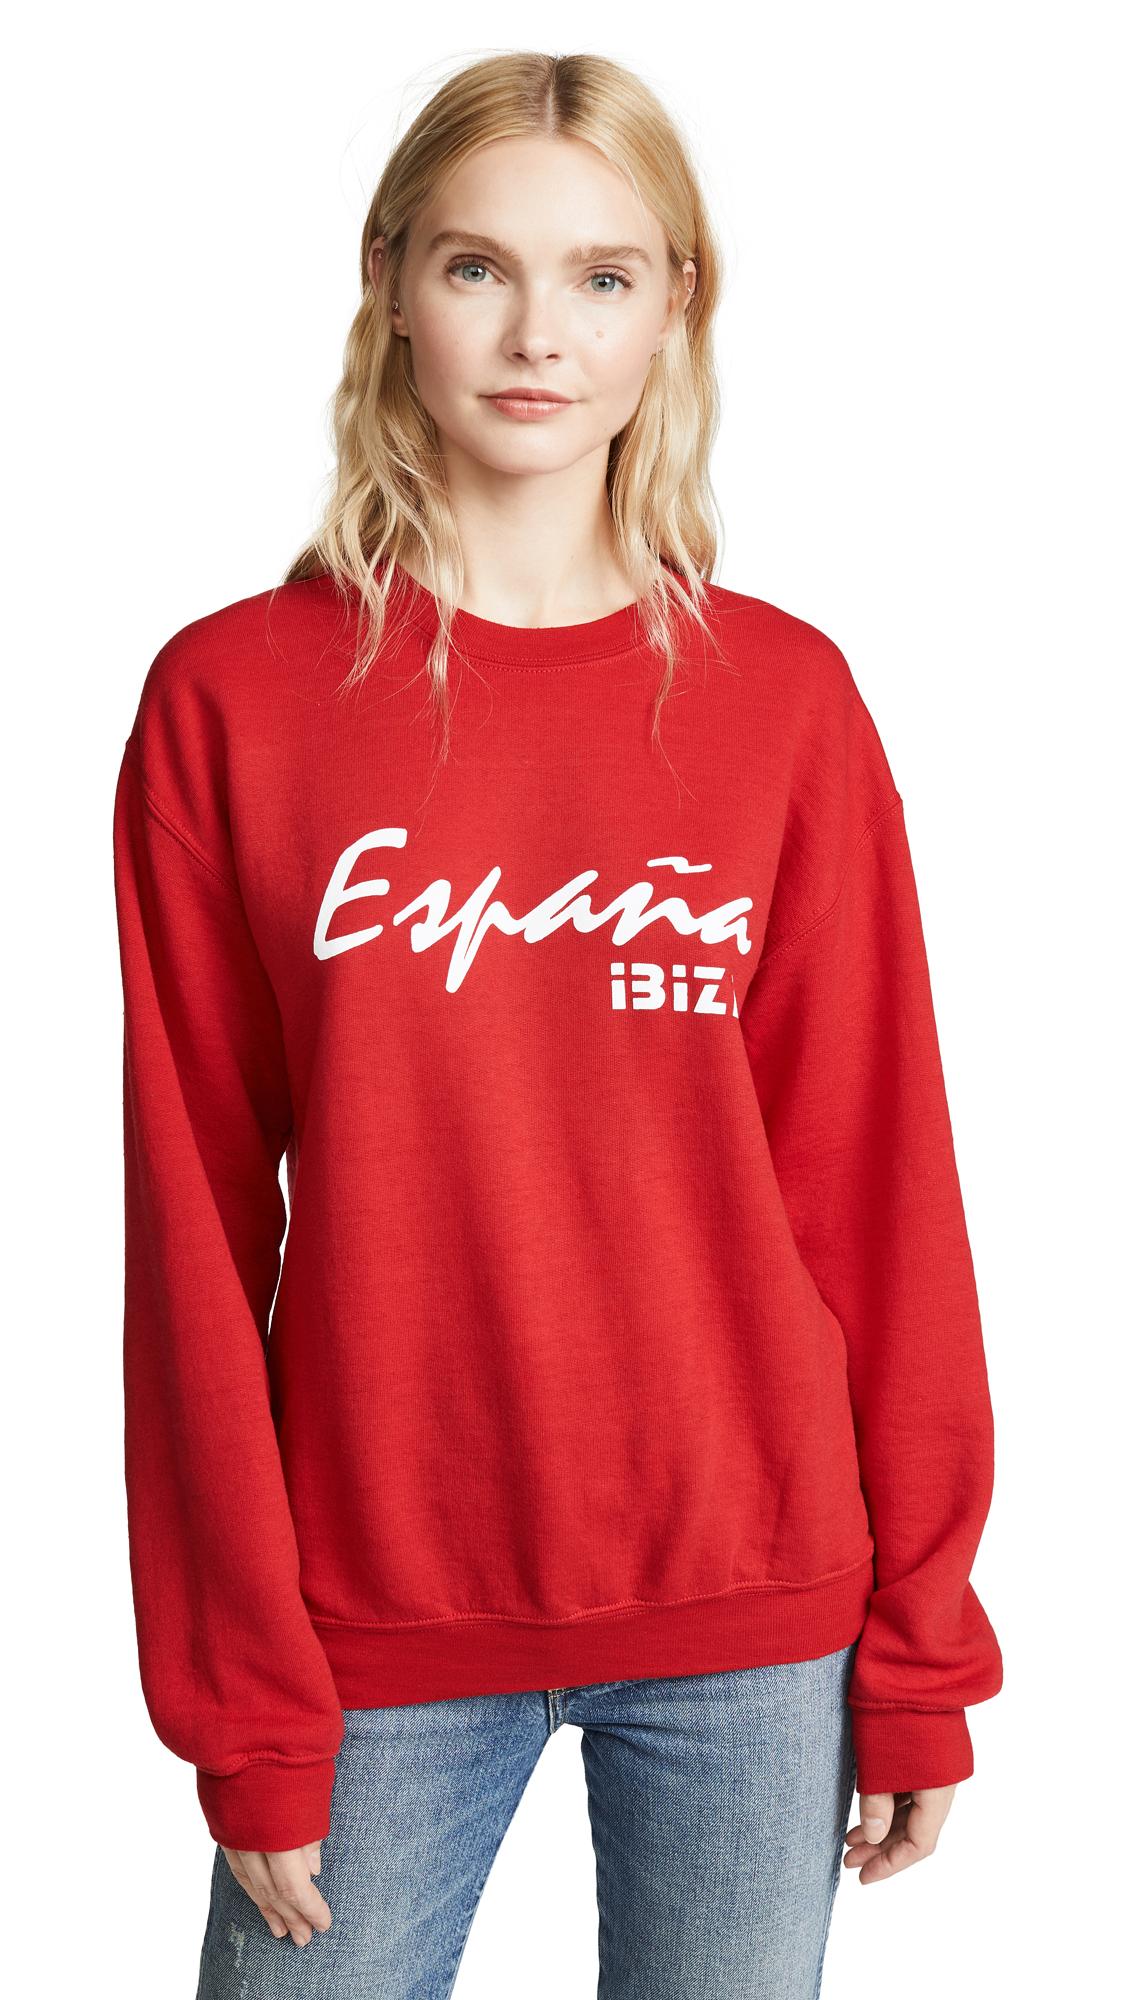 RXMANCE Espana Sweatshirt in Faded Red